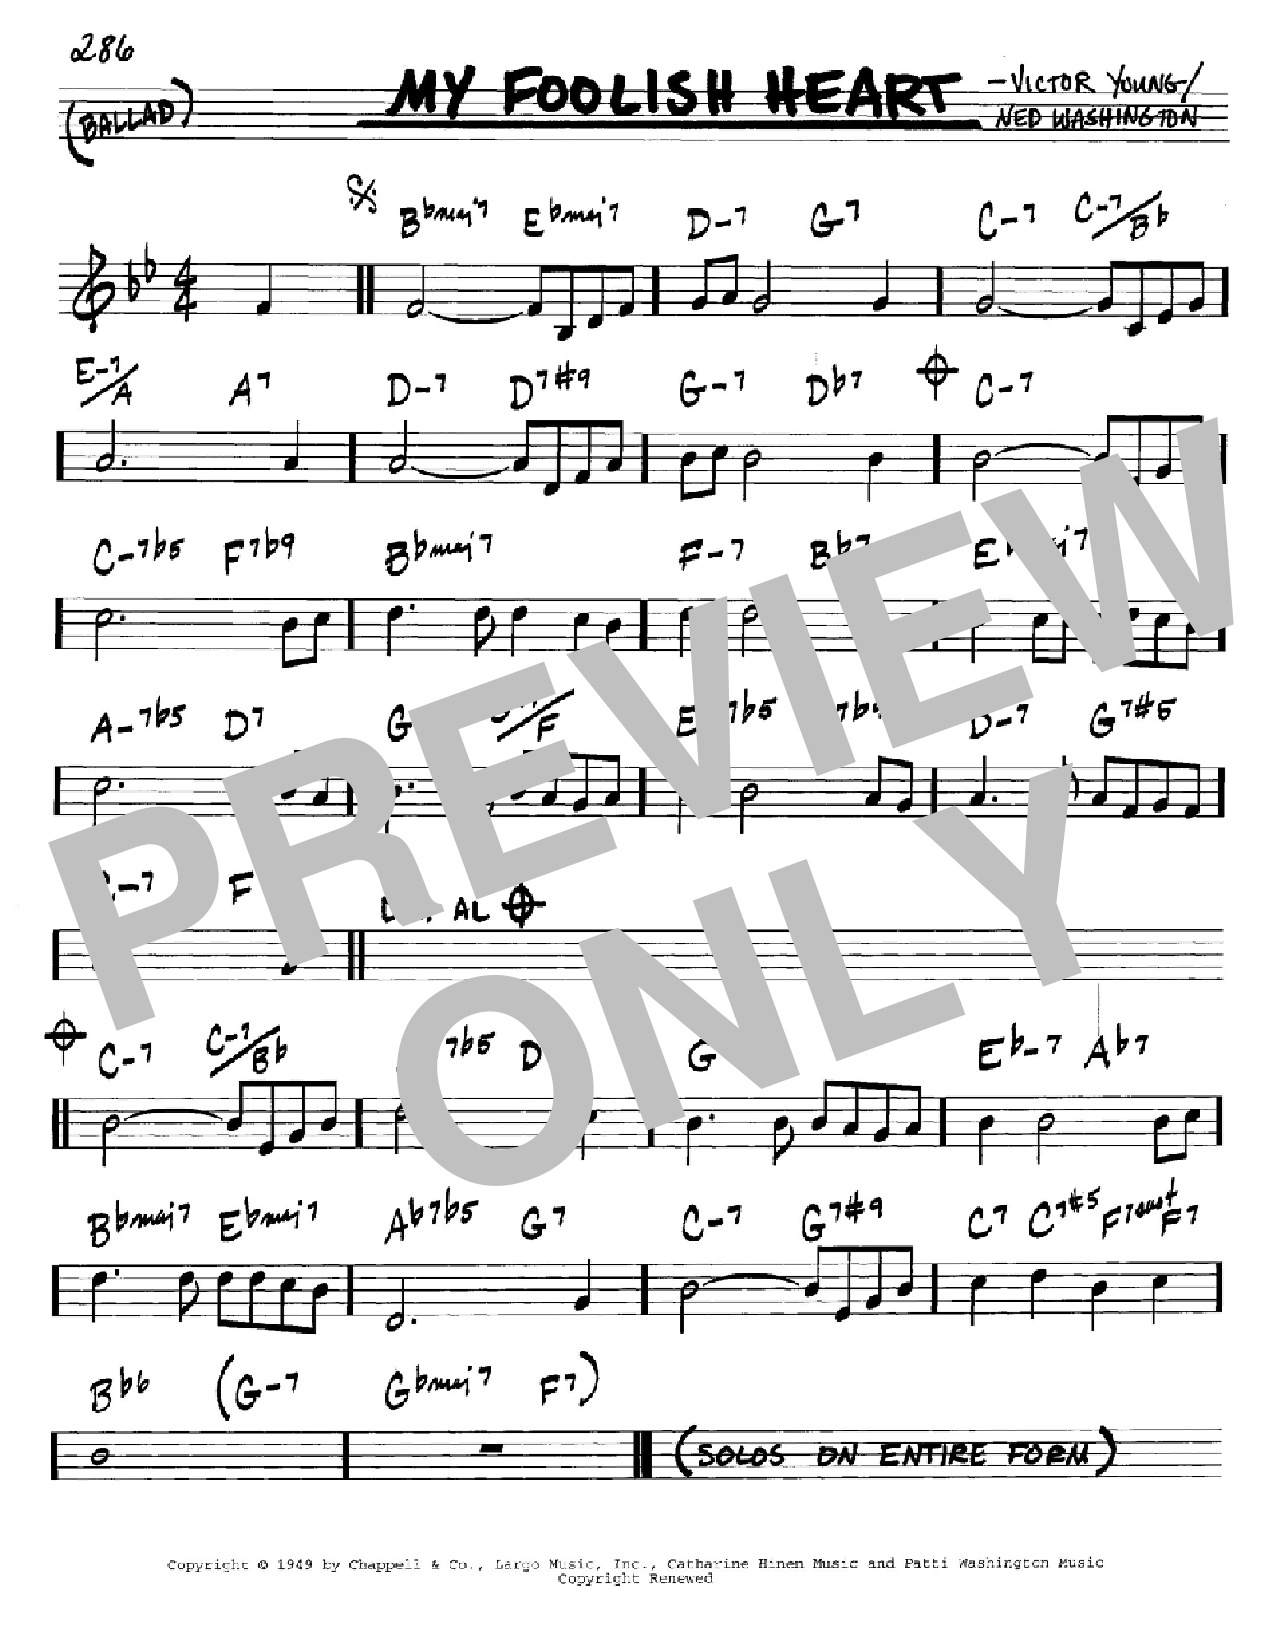 Foolish Heart Steve Perry Remix MP3 Download » LiveBandTube